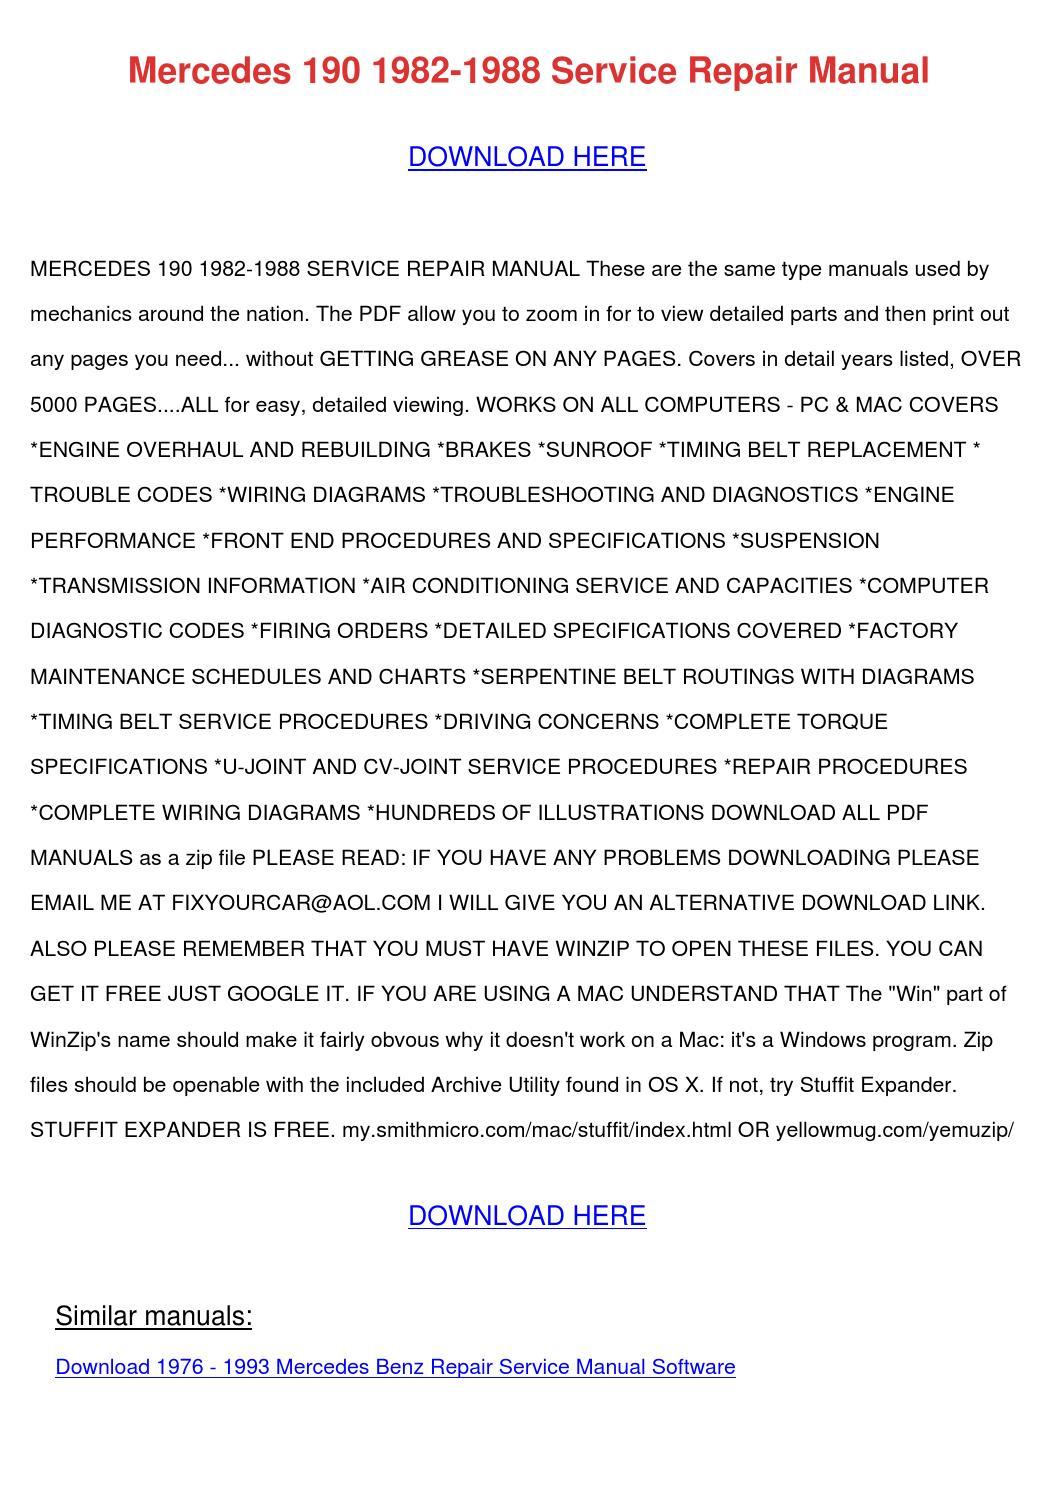 Mercedes 190 1982 1988 Service Repair Manual By Preciousperryman Issuu 2001 Cl600 Fuse Diagram